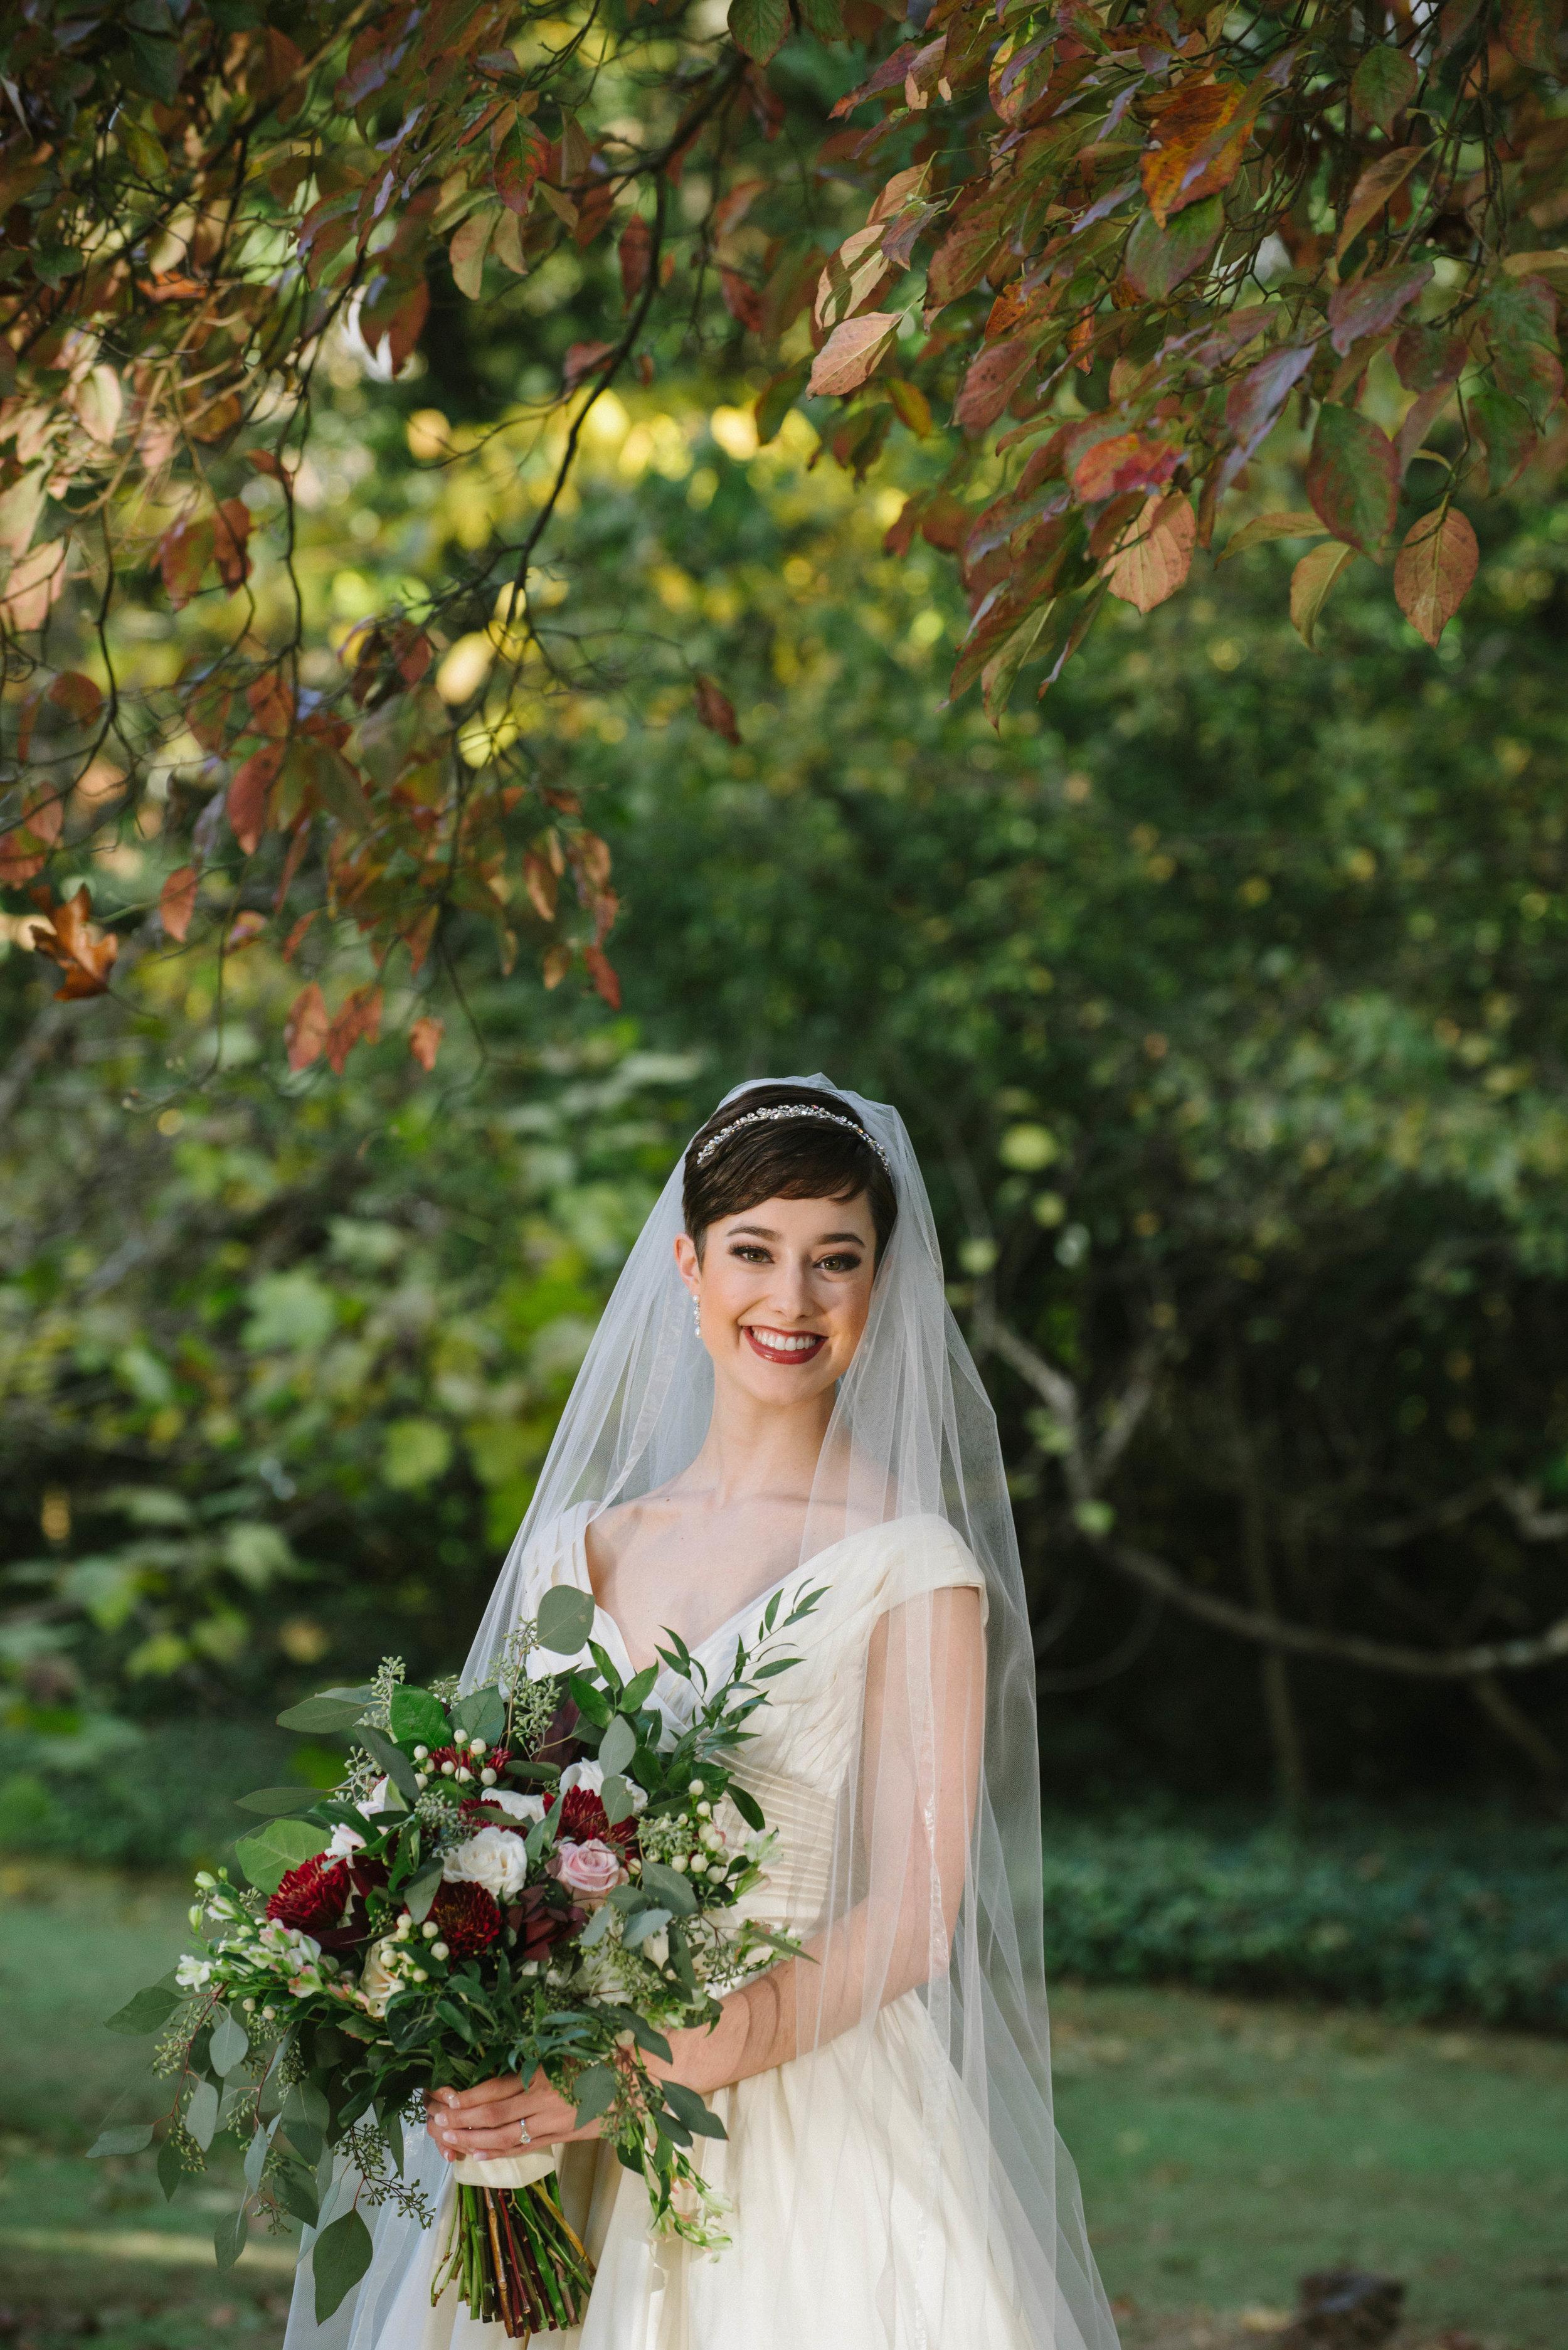 CarolineMerritt|Bridals|_Color_MiraPhotographs-55.jpg